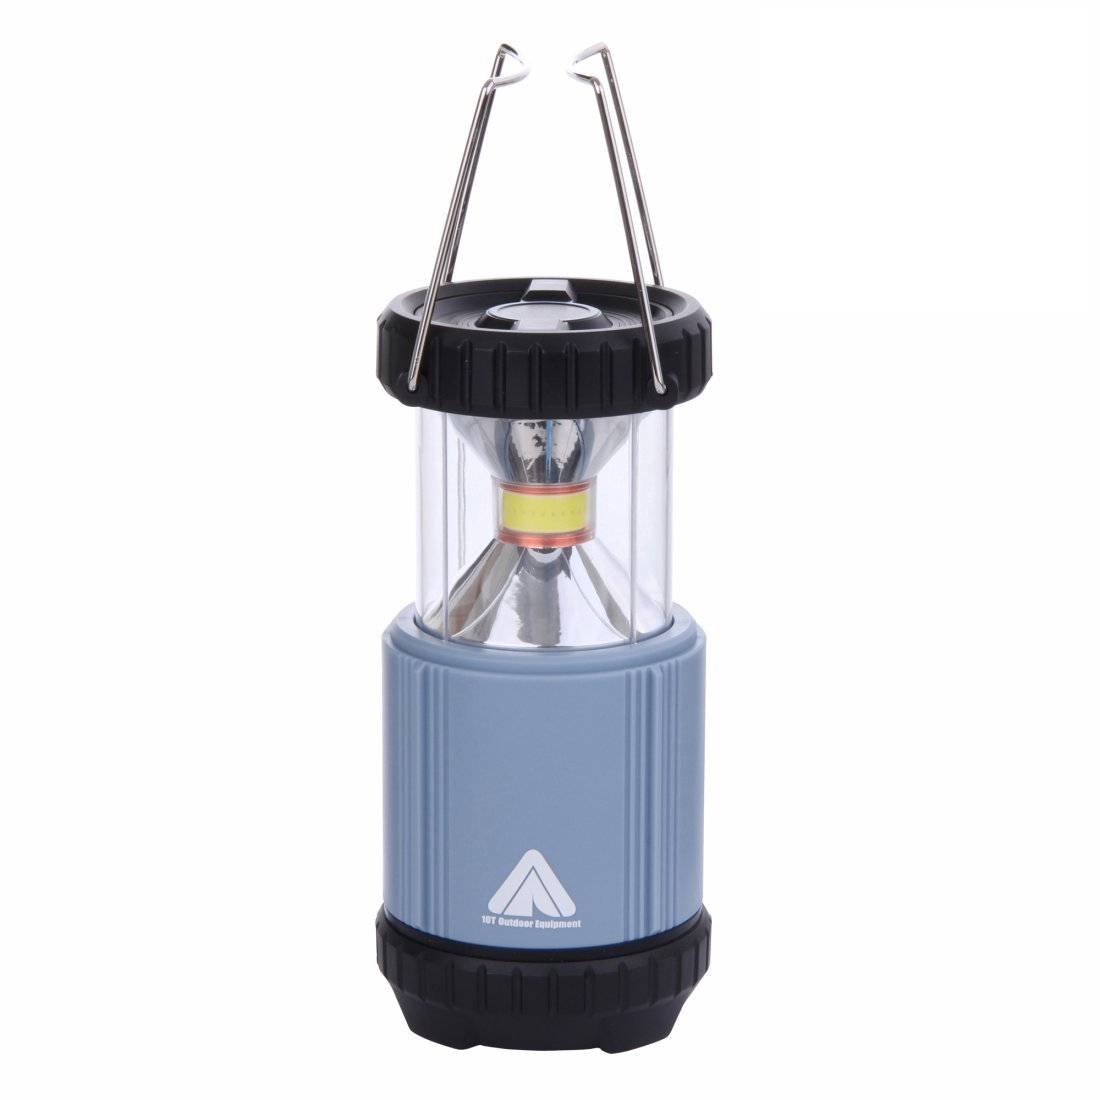 /Ø 89 x 123 mm blau 342 g Laterne 10T COL 300 COB LED 5W helle Camping-Lampe mit 300 Lumen